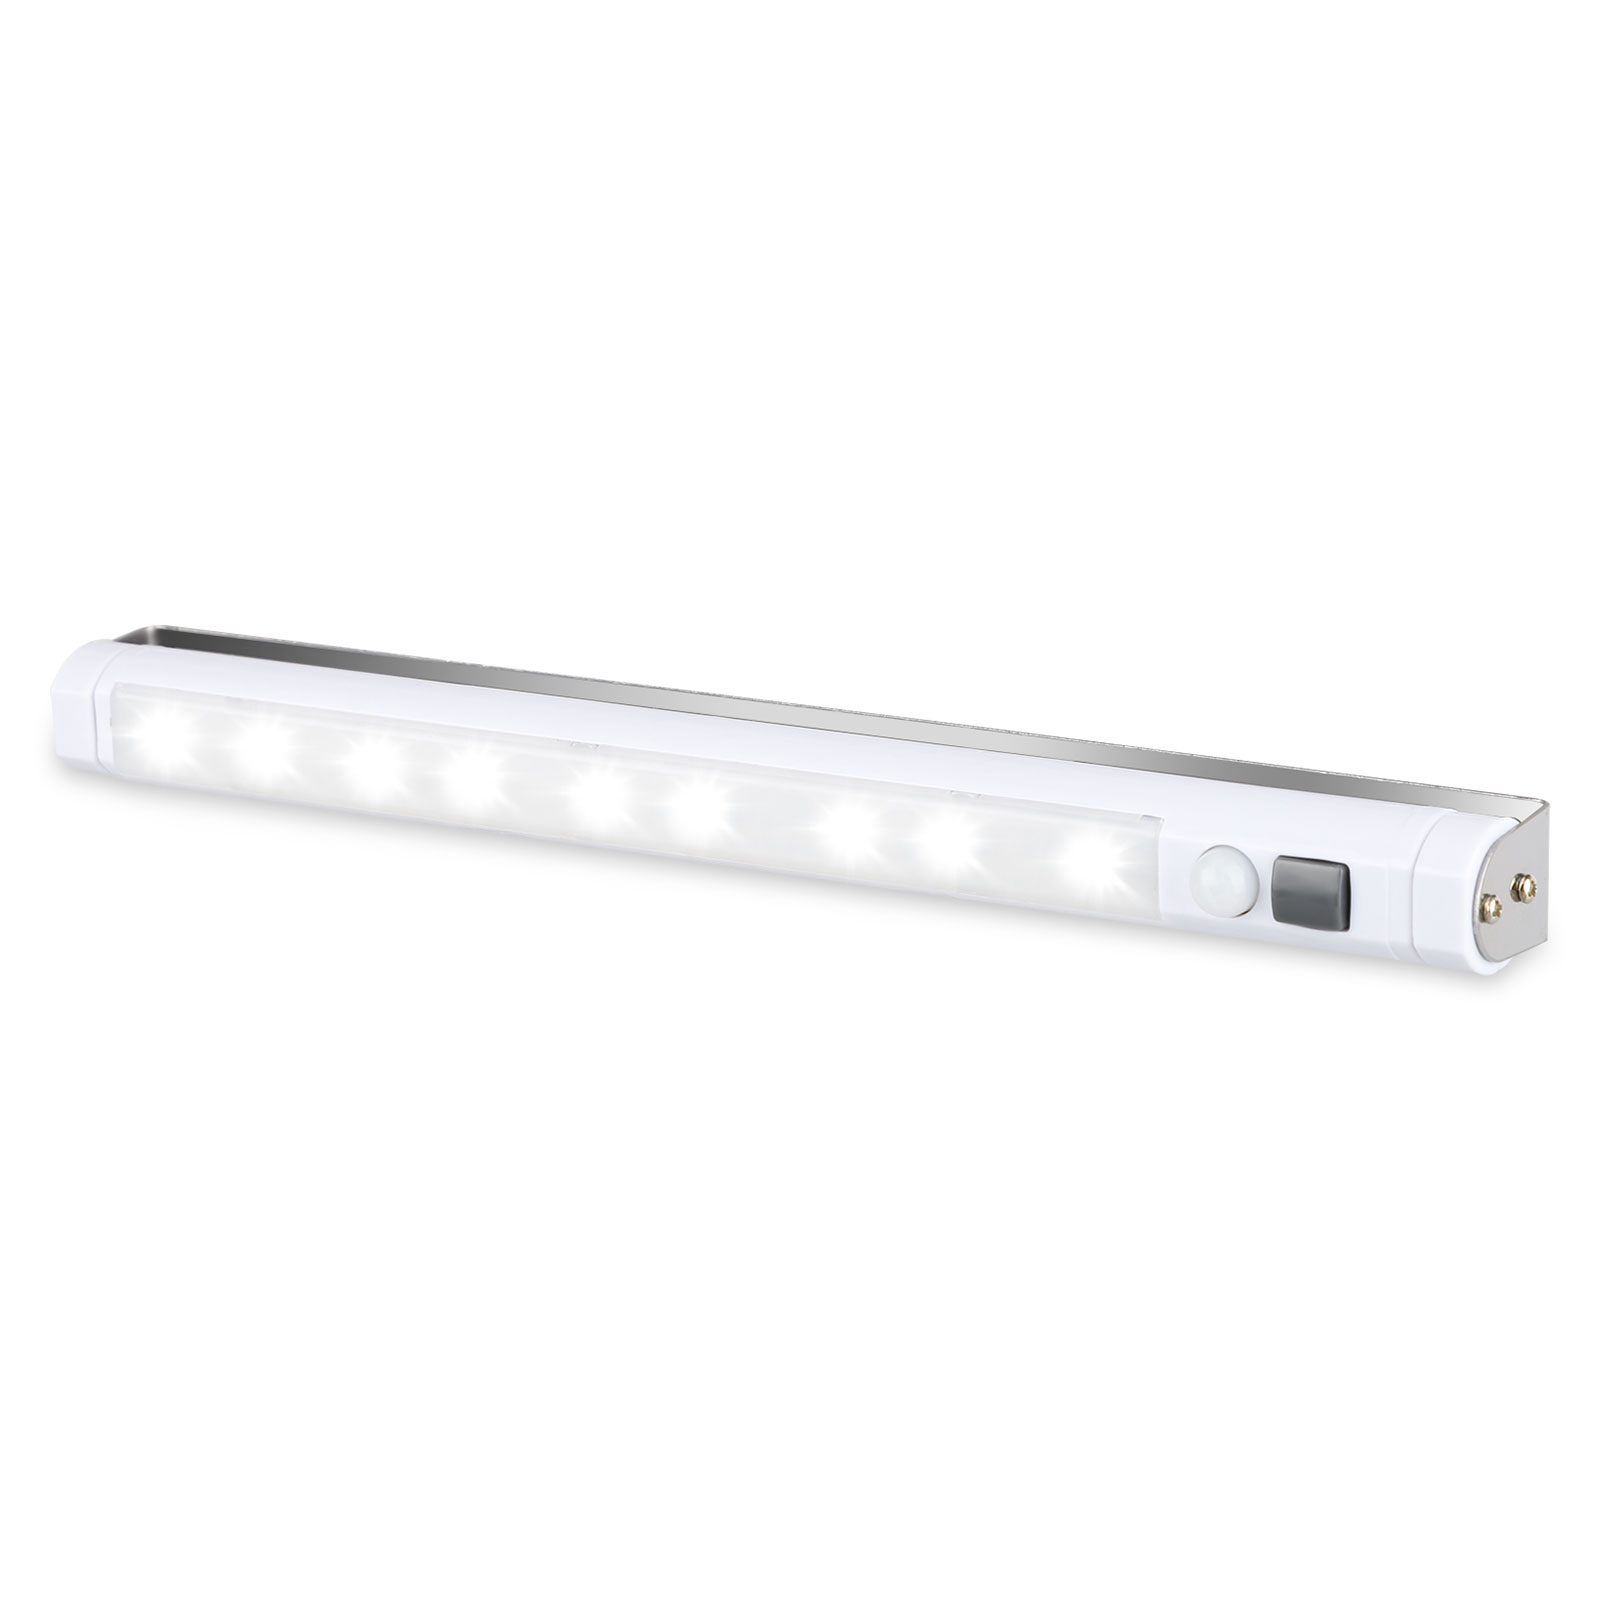 Homelife Motion Sensor Adhesive Led Light Bar Eeekit Shelf